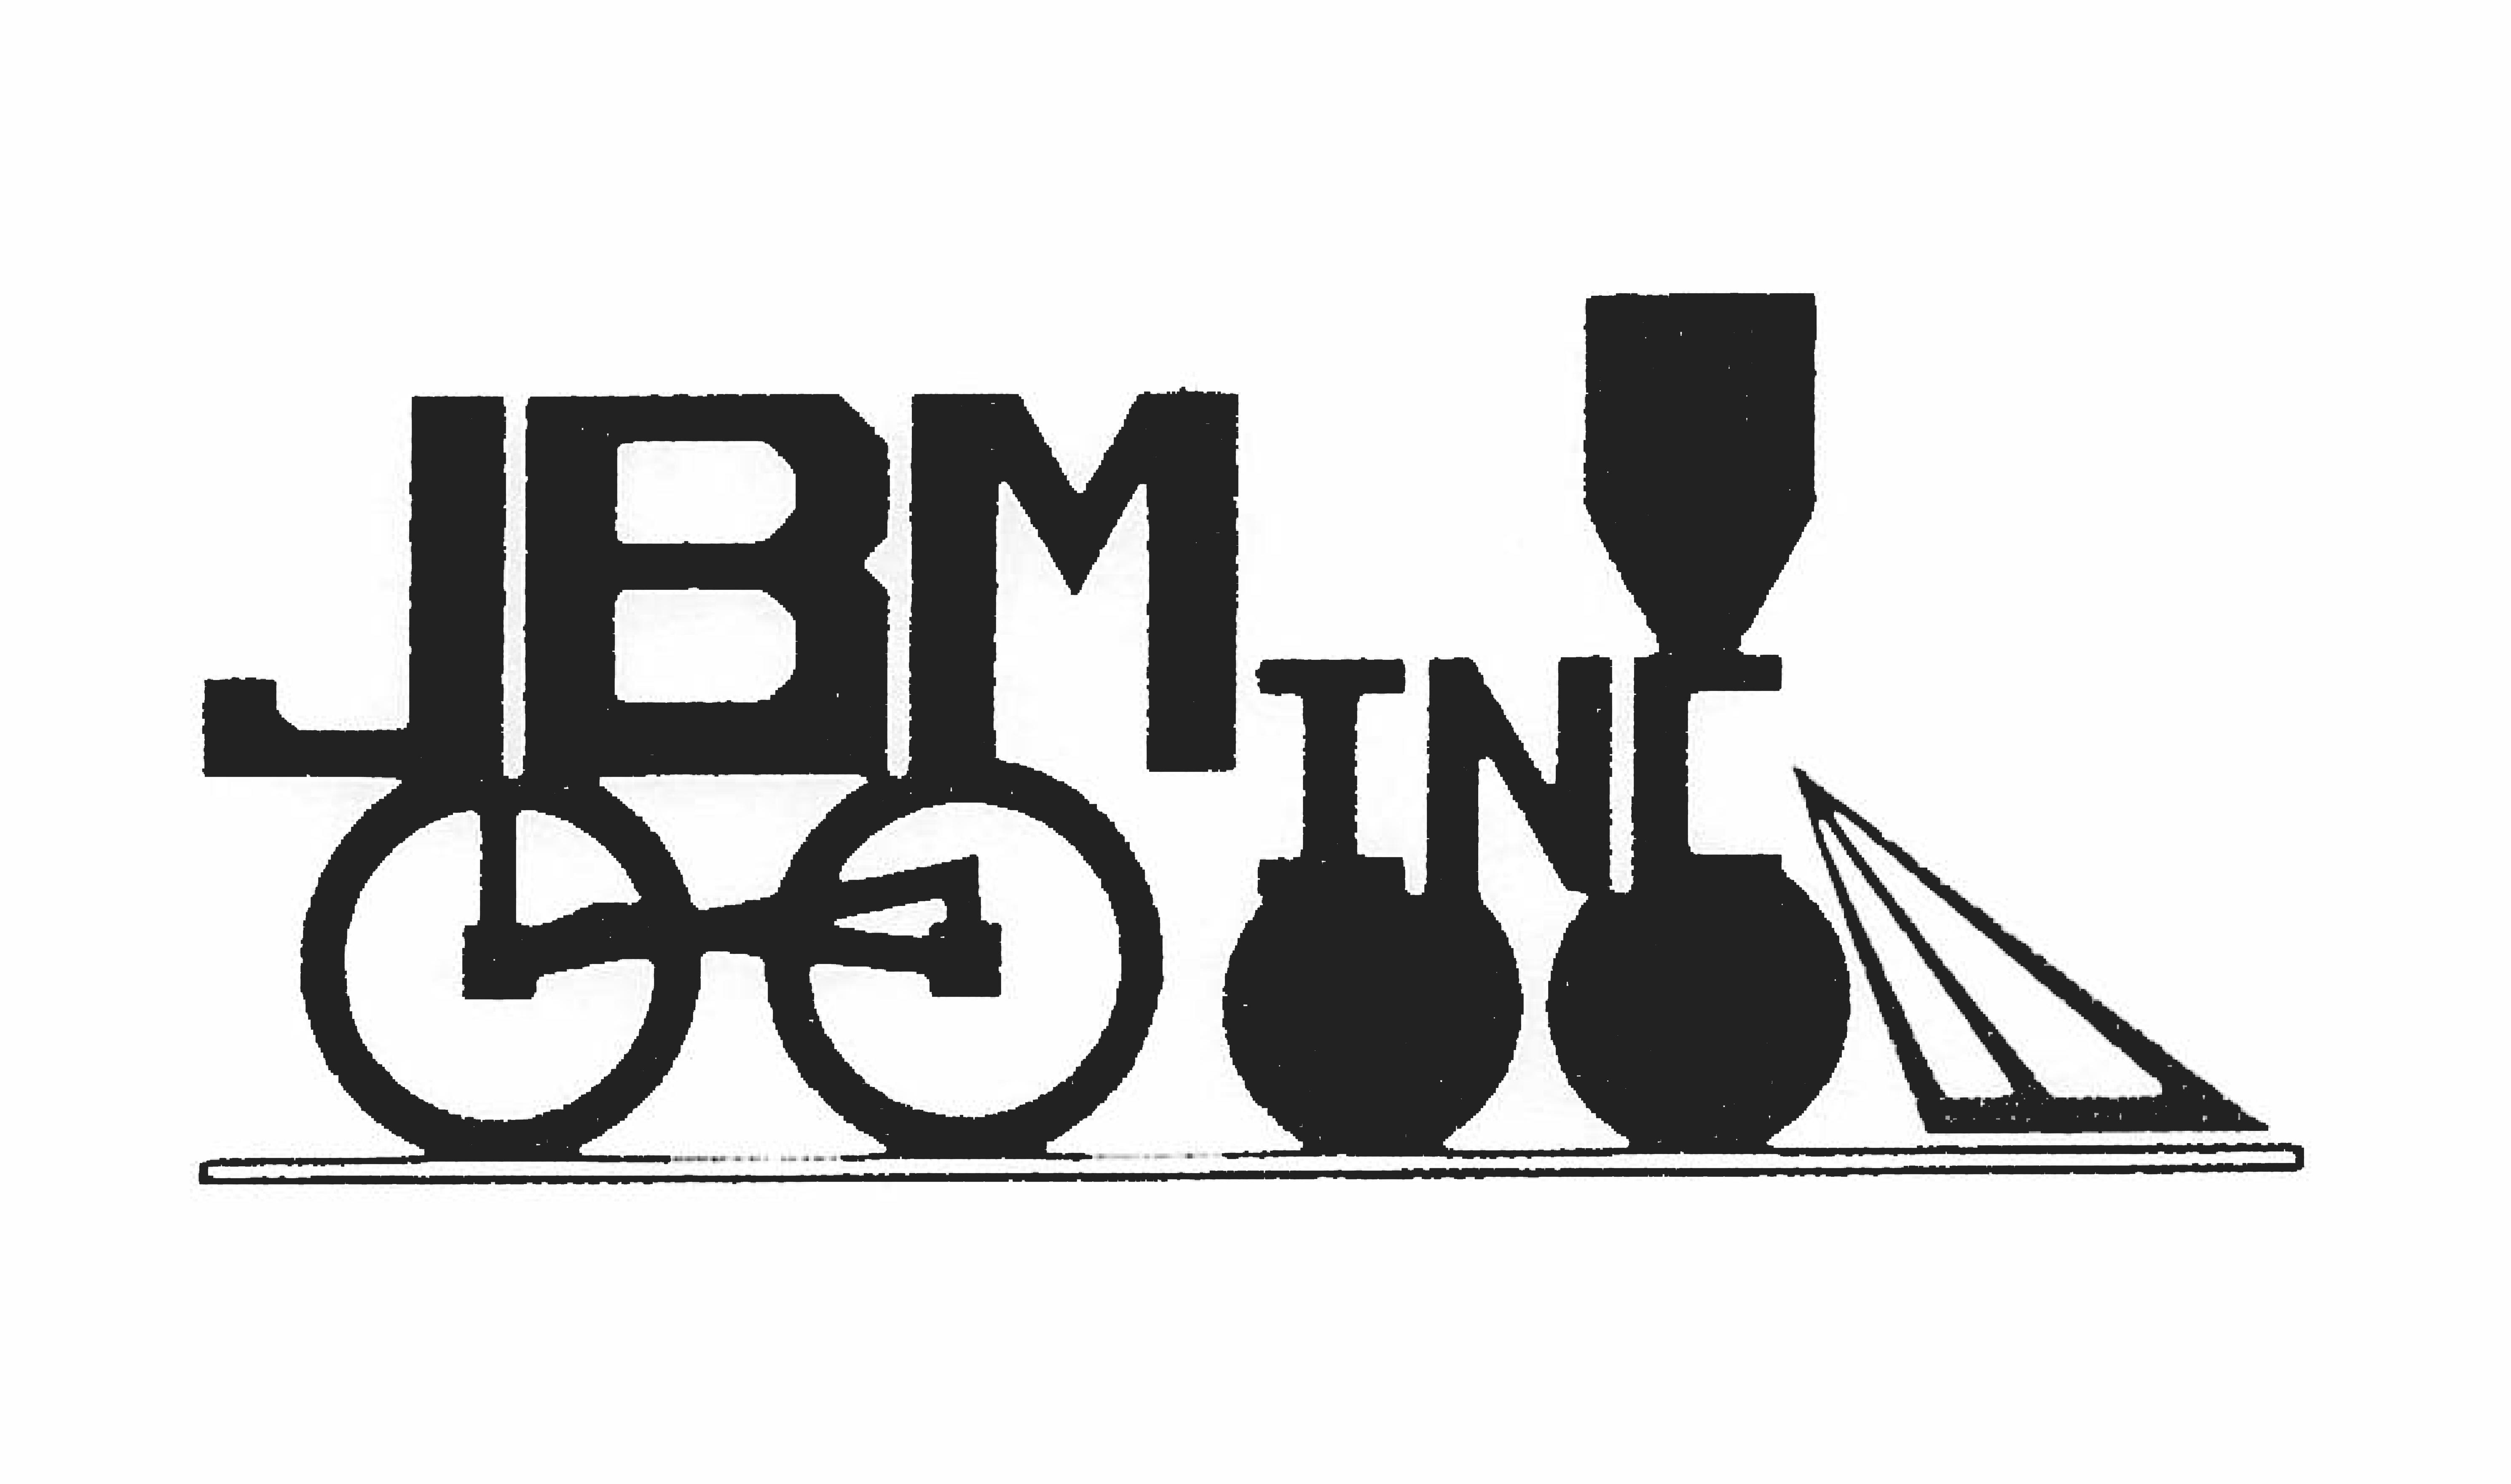 Silver - J Bard McLean Inc. - Logo